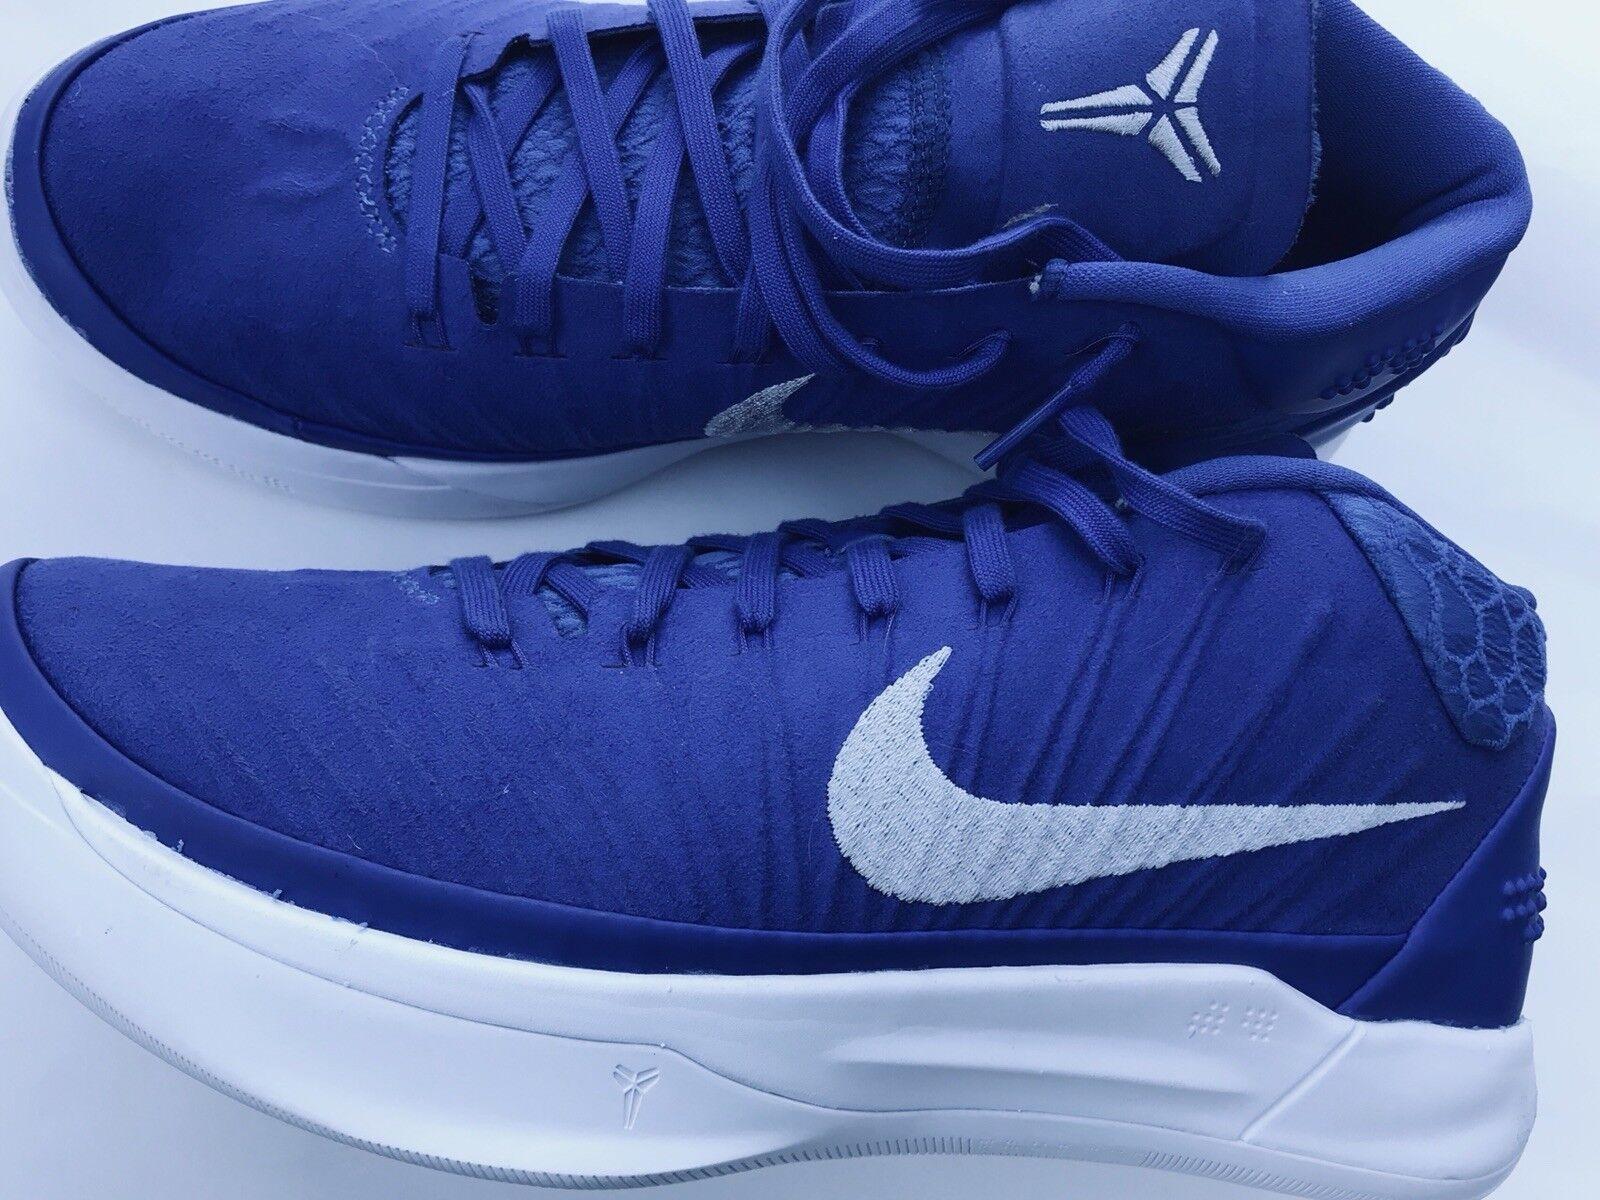 Nike Kobe AD TB Promo Game Royal White Mens Basketball shoes 942521 400 Sz 8.5